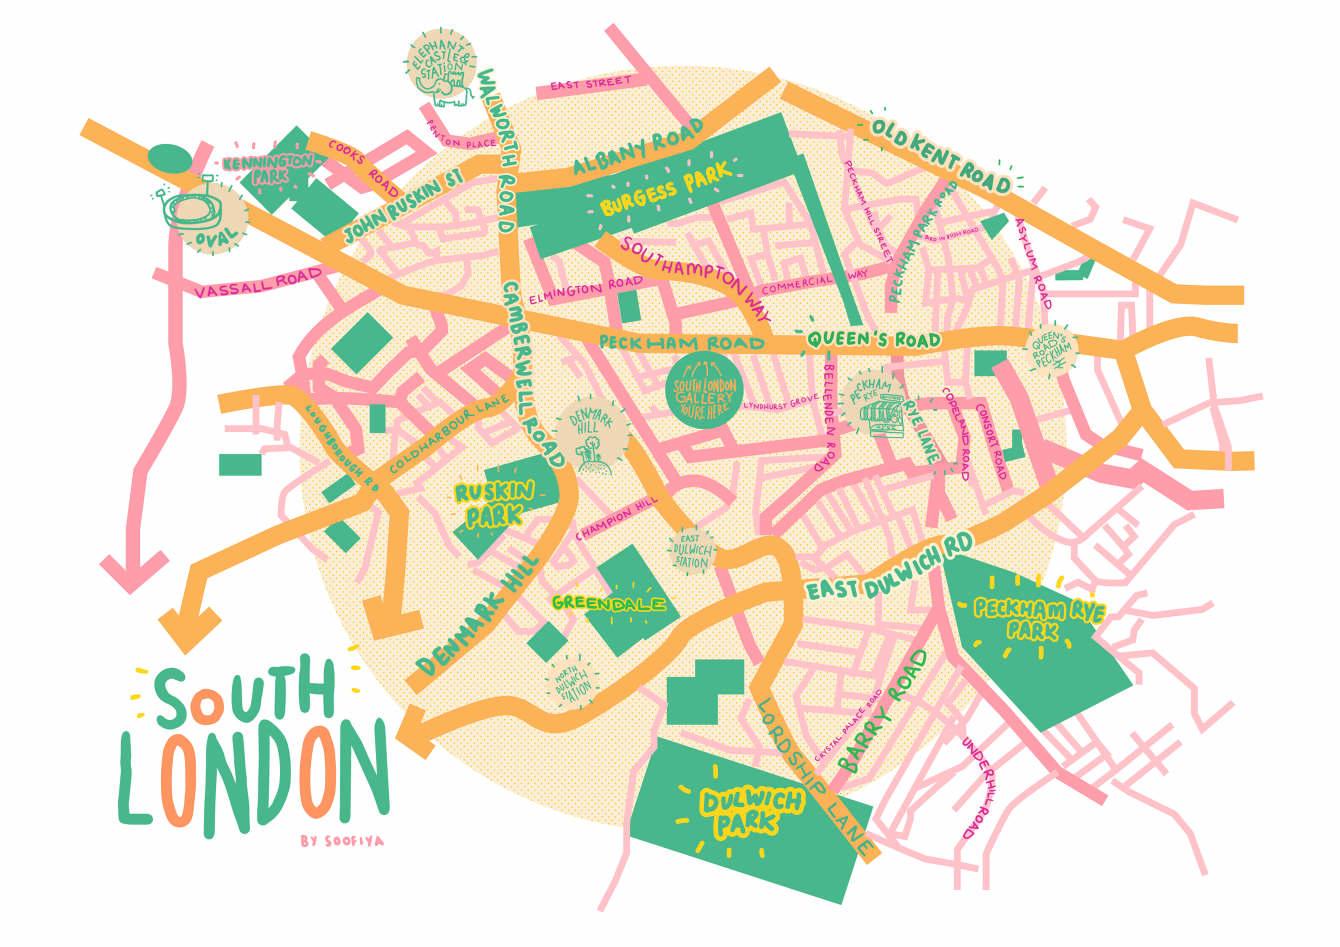 South London Map.South London Gallery Map Soofiya